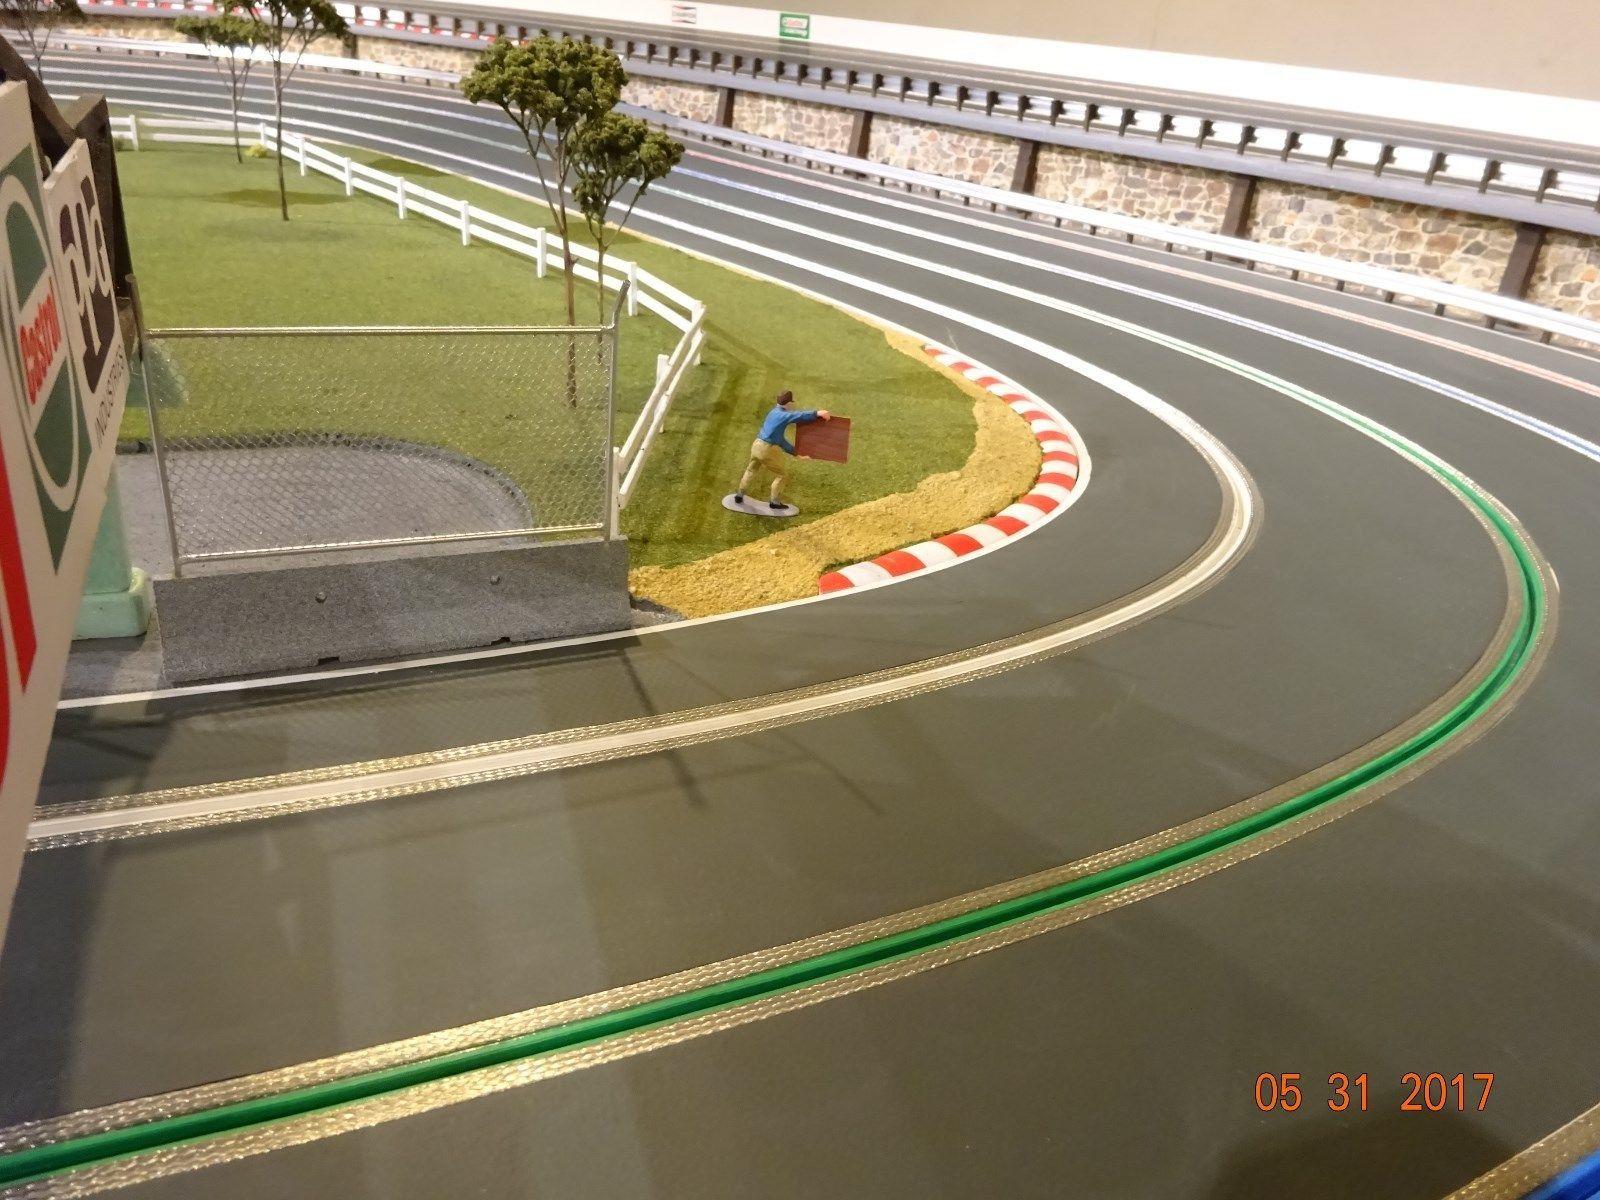 1 32 Scale Aluminum Armco Guardrail System Slot Car Track Diorama Scenery Ebay Slot Cars Slot Car Track Scenery